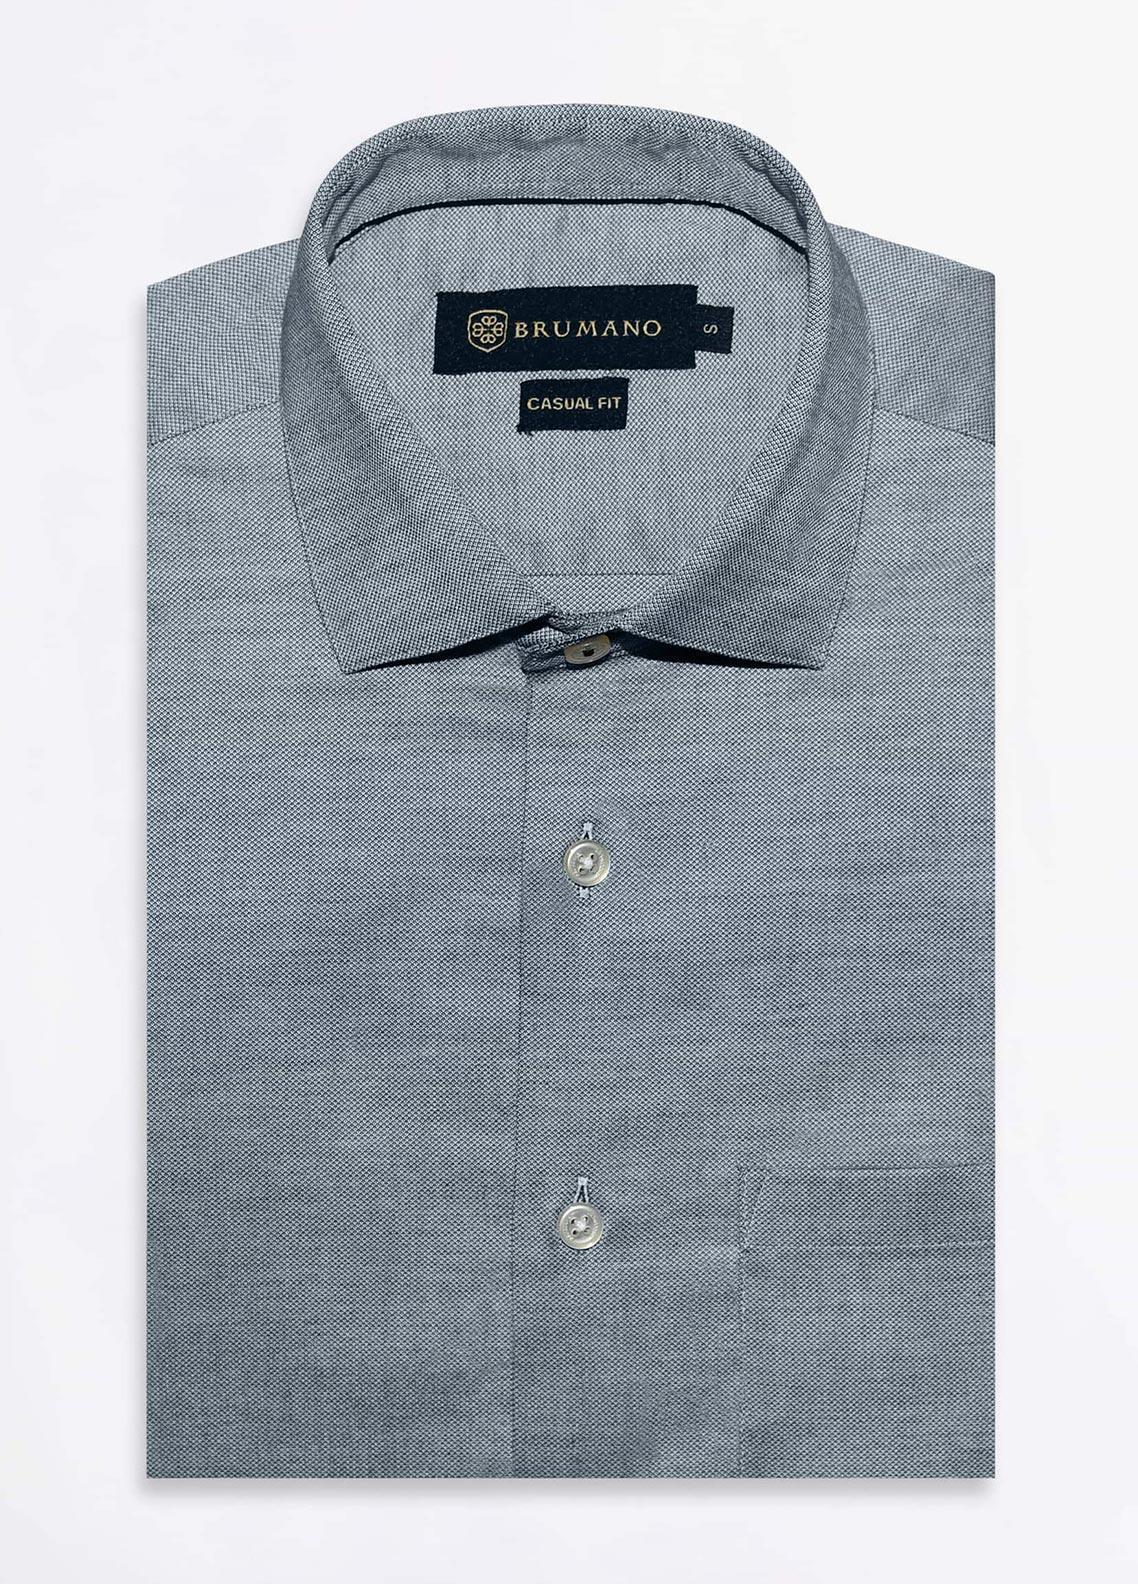 Brumano Cotton Formal Men Shirts -  BRM-1038